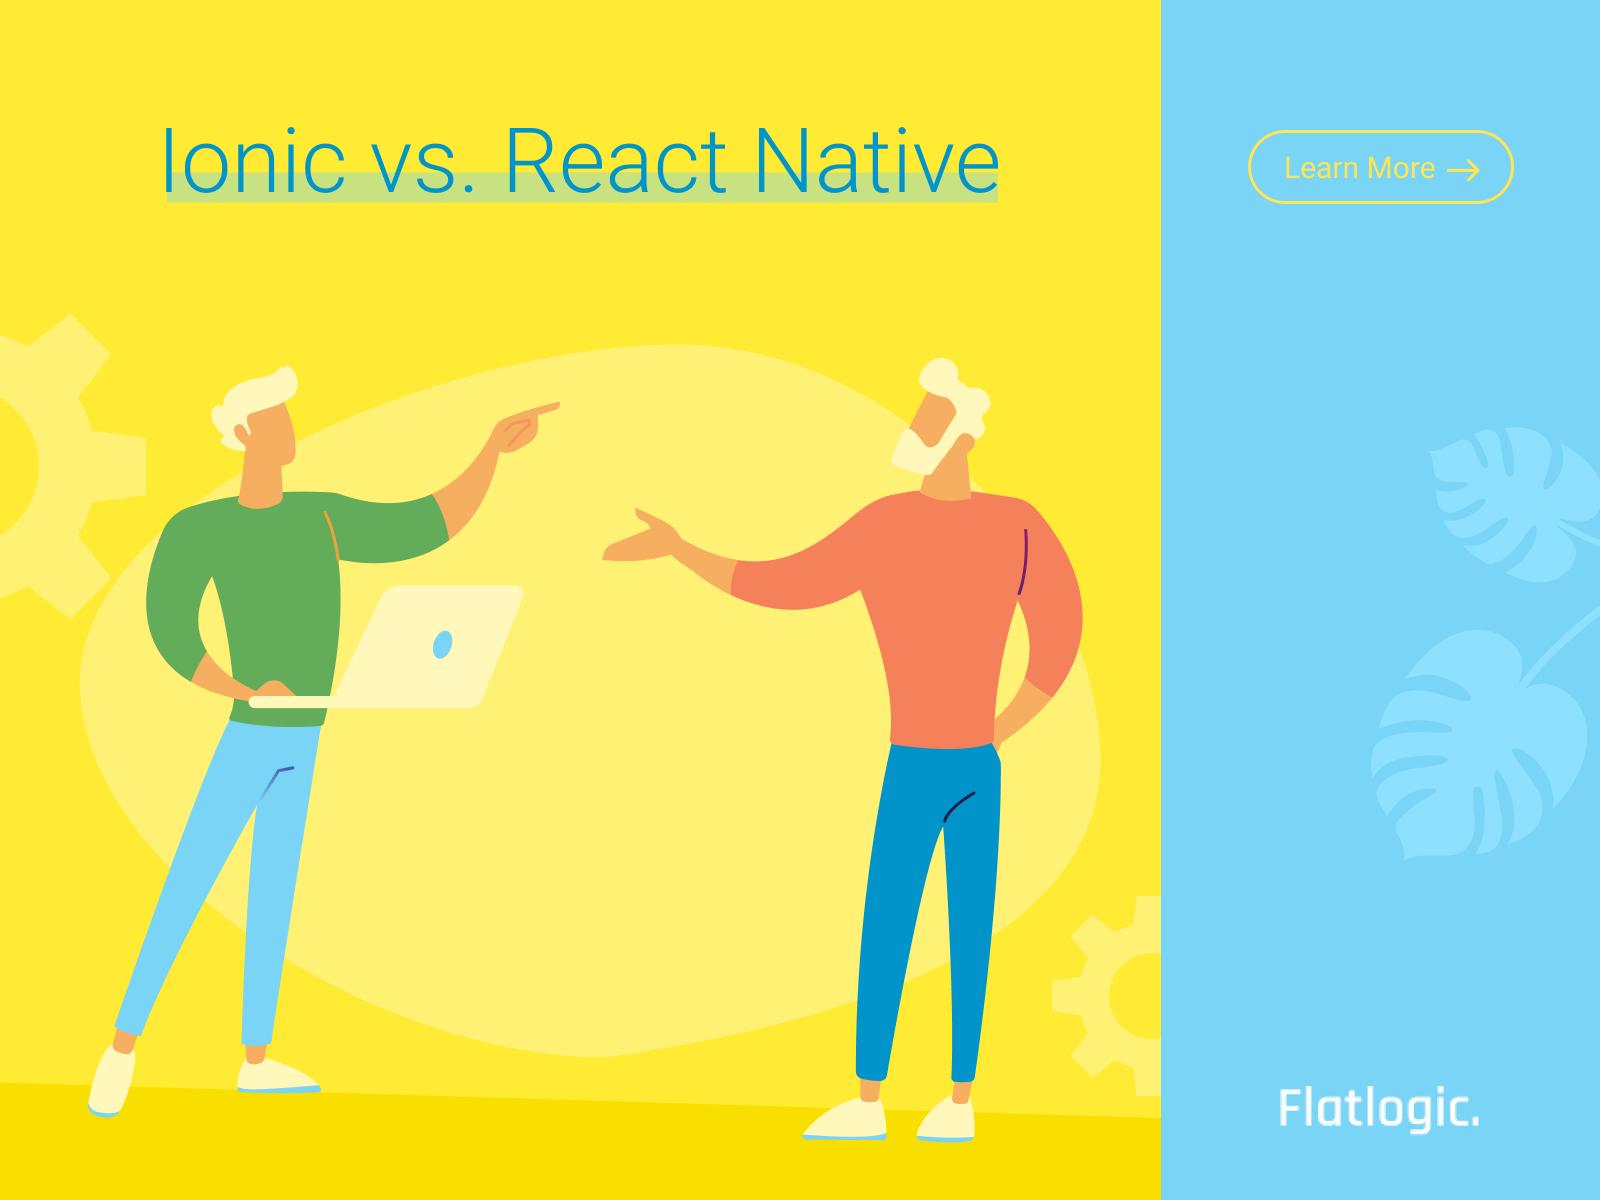 React Native vs. Ionic: What Cross-Platform Framework is the Best?